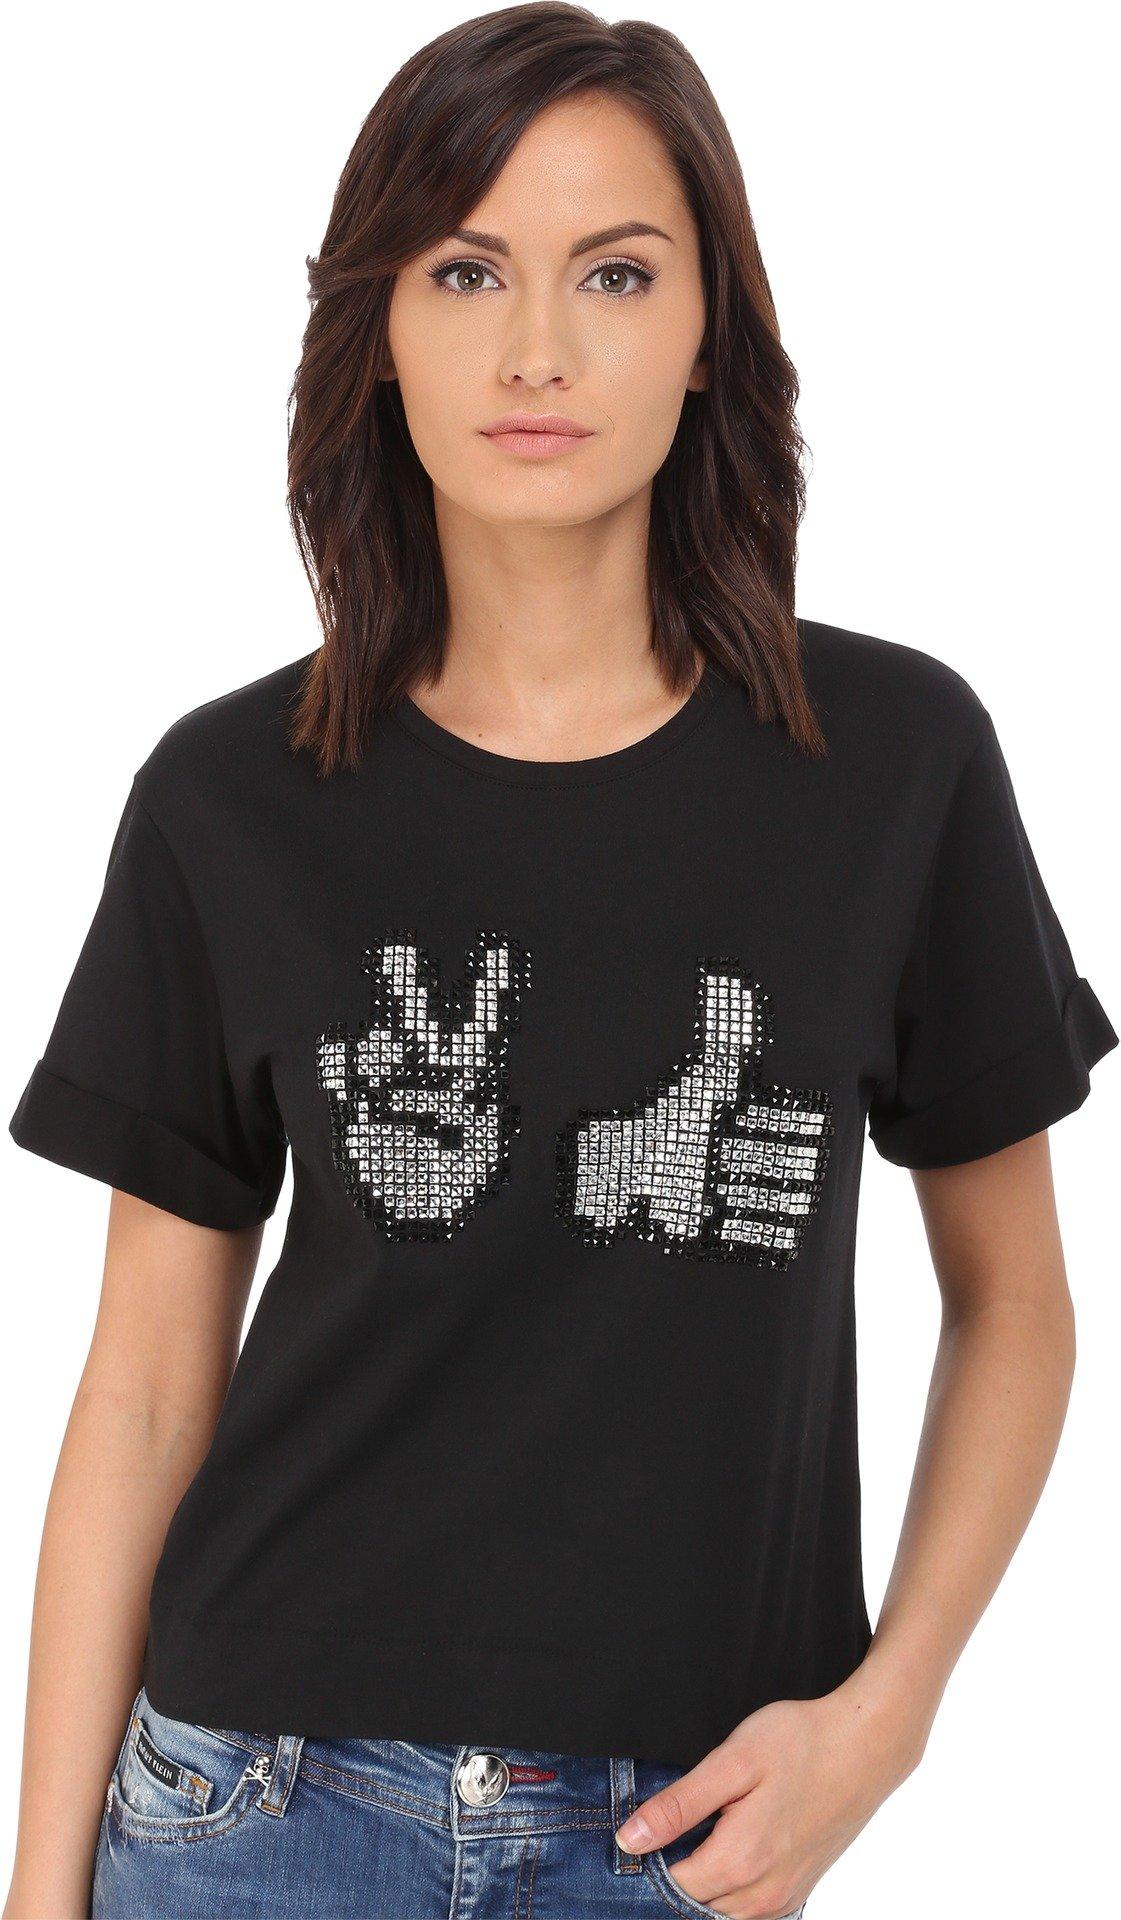 Philipp Plein Women's Thumbs Up T-Shirt Black LG